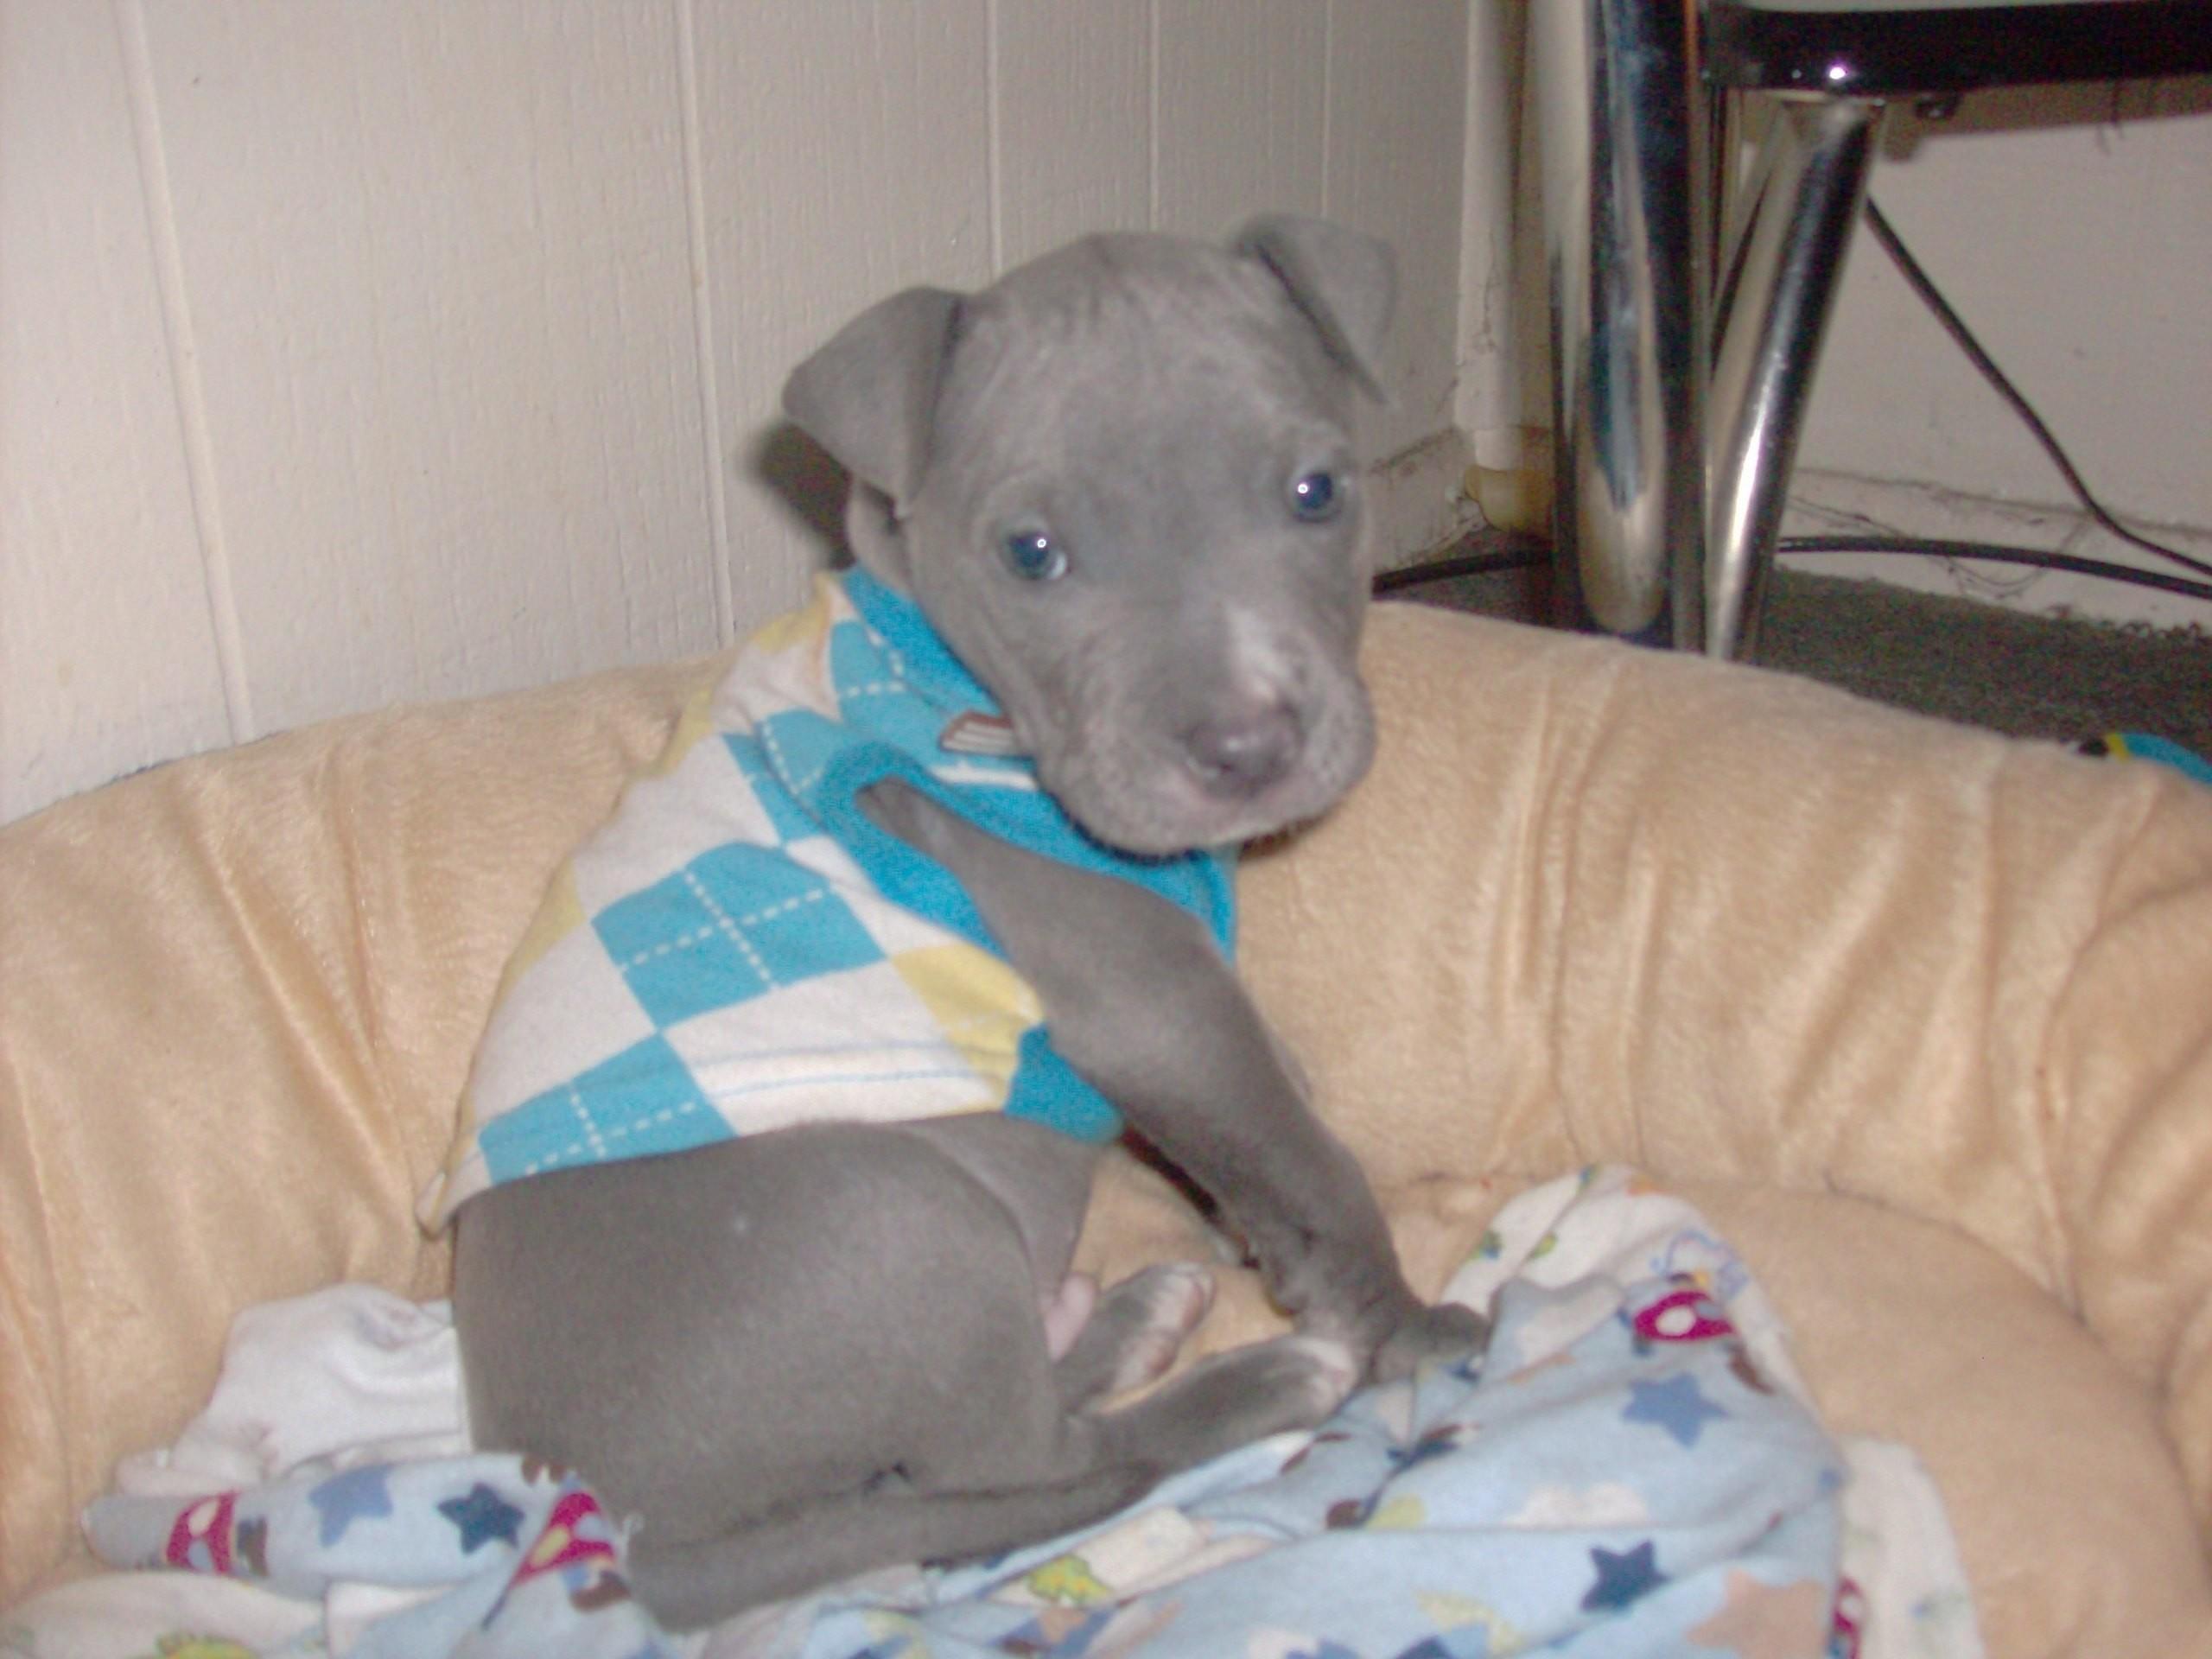 PitBulls images Bleu as a Puppy HD wallpaper and background photos